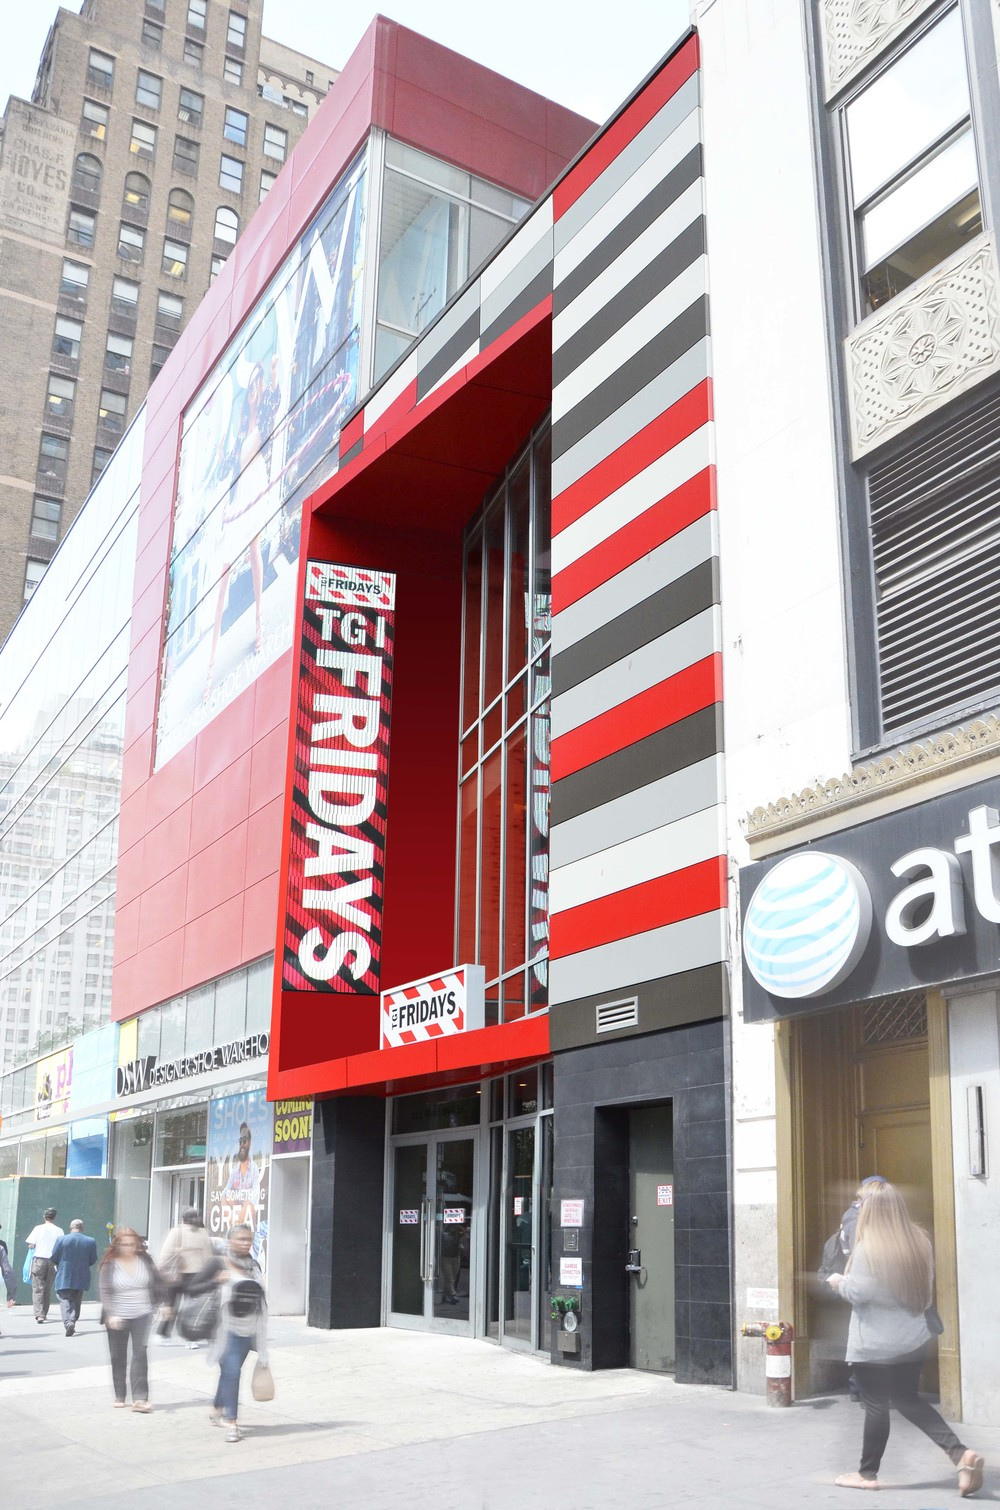 Tobin Parnes Design. TGI Friday's. NYC. Hospitality Design. Restaurant. Facade. Storefront. Stripes